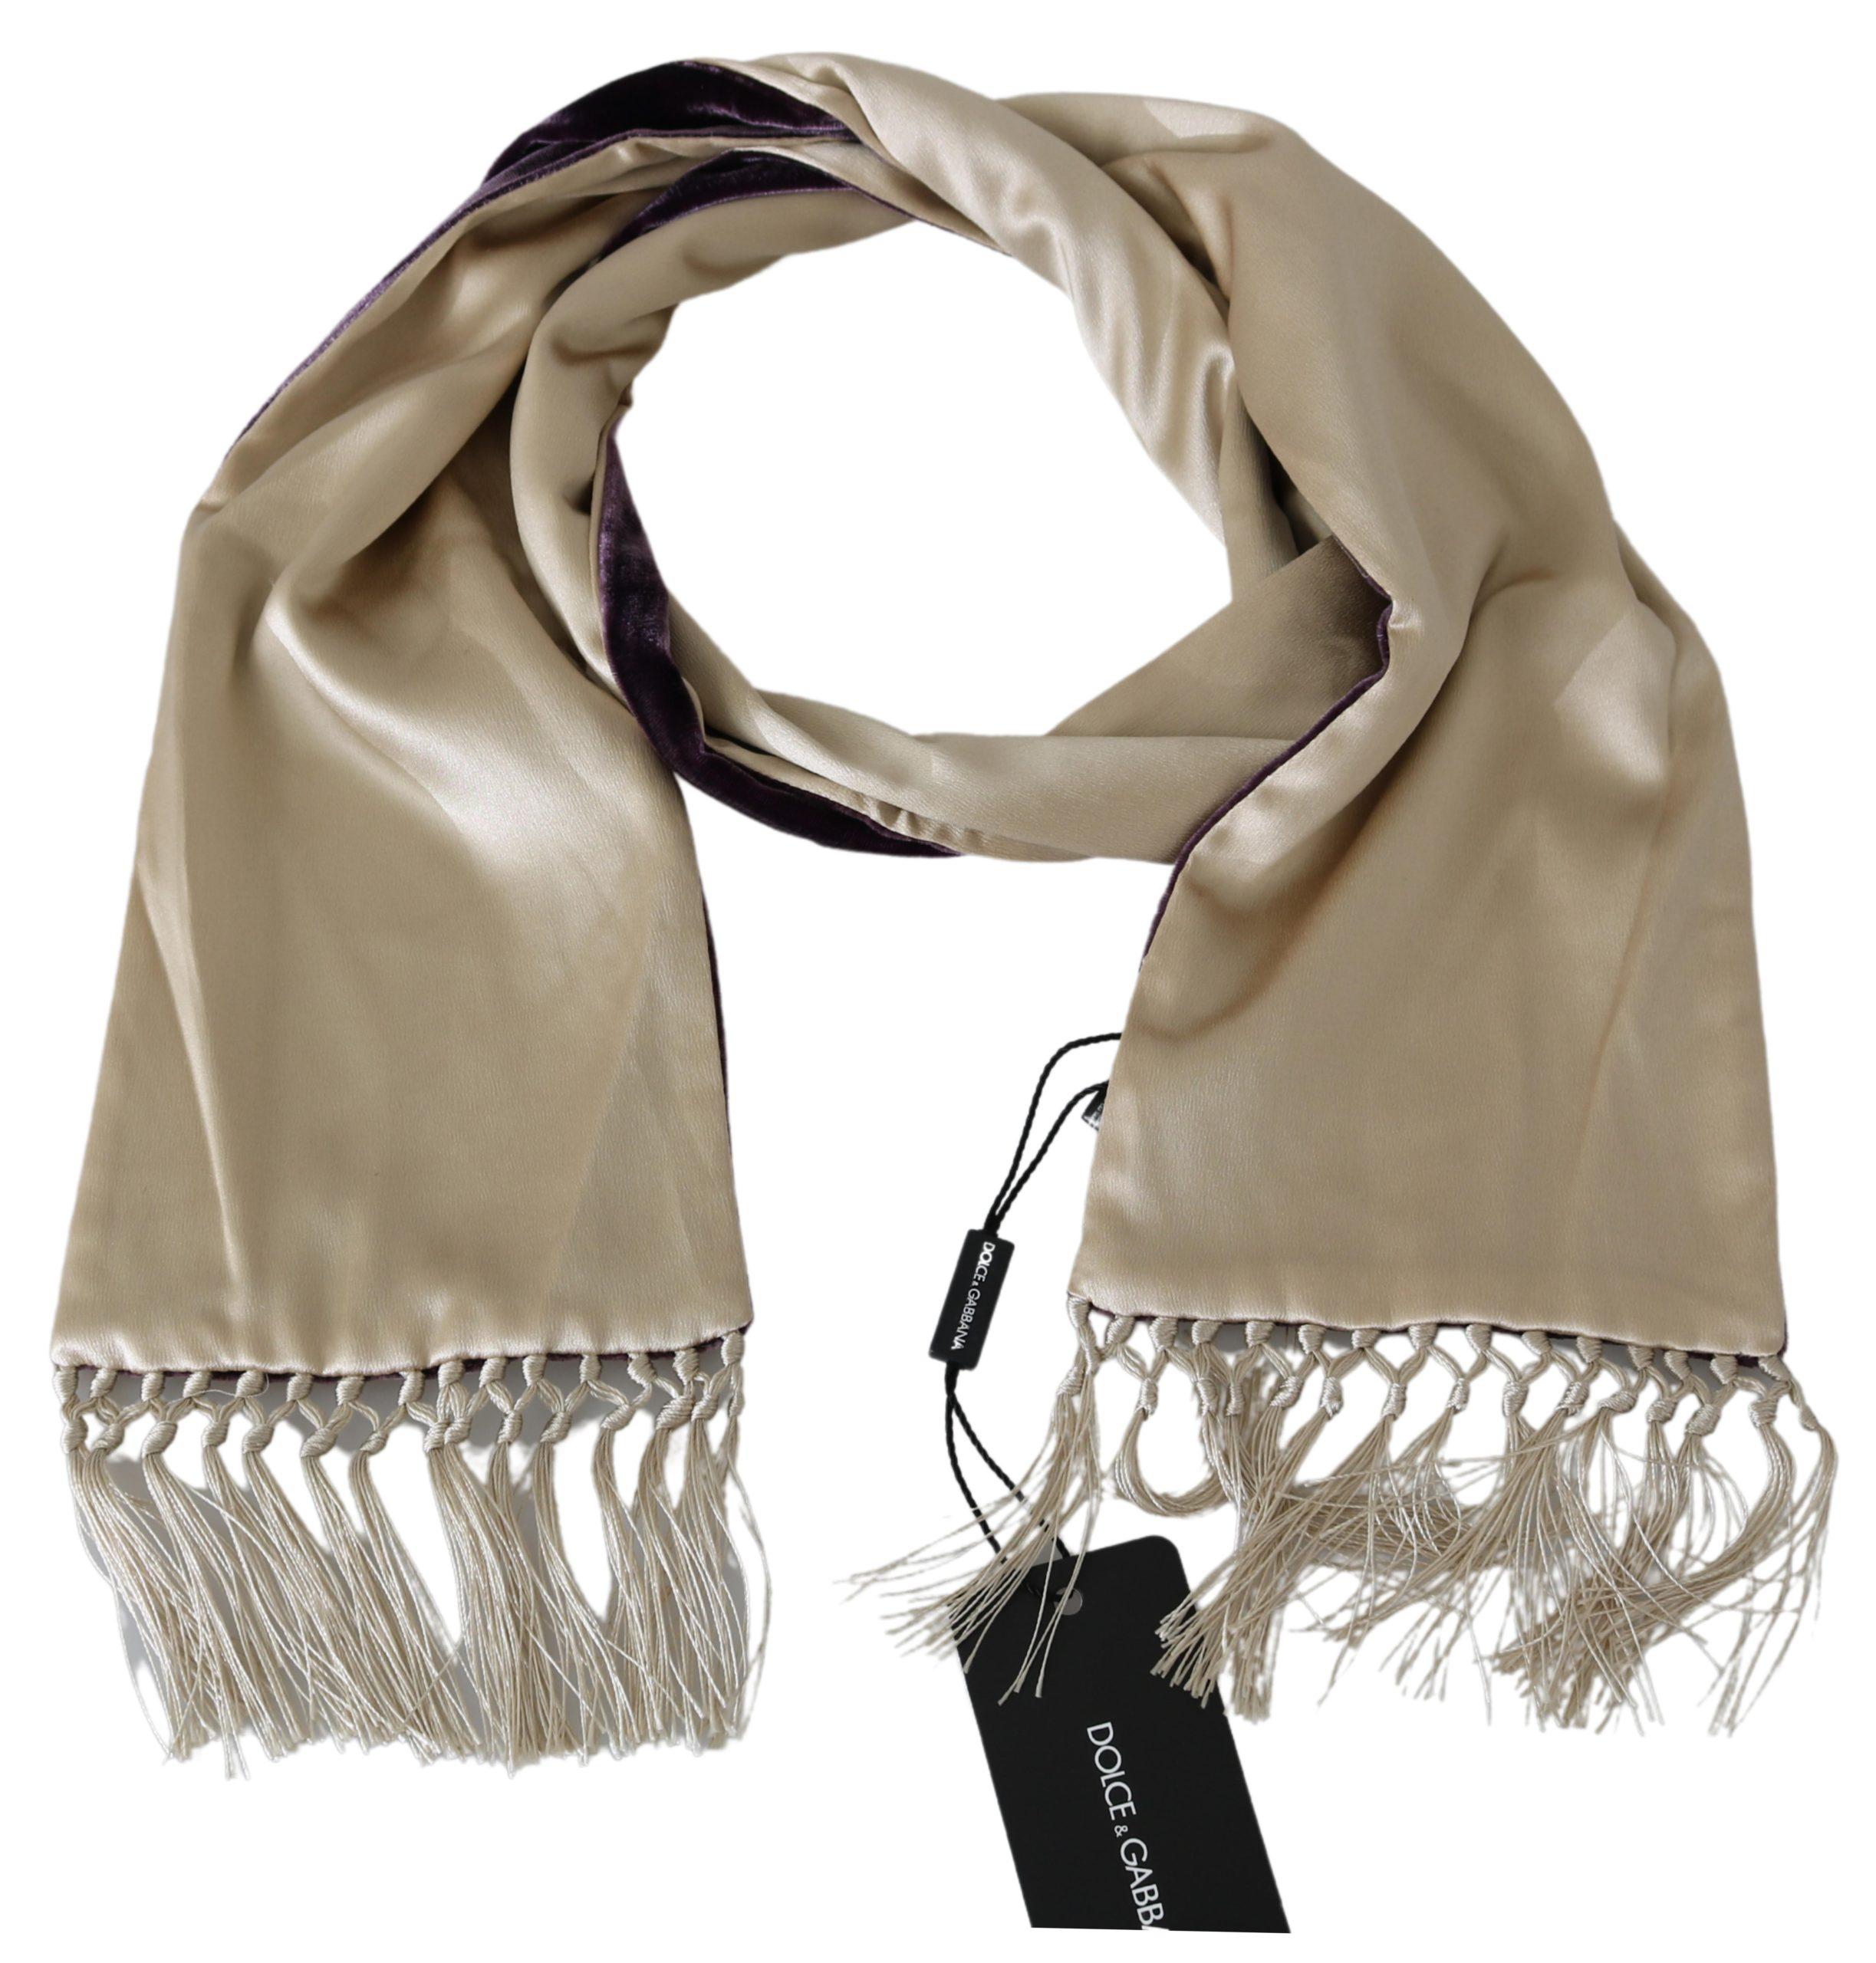 Dolce & Gabbana Men's Silk Viscose Wrap Scarf Beige MS1762